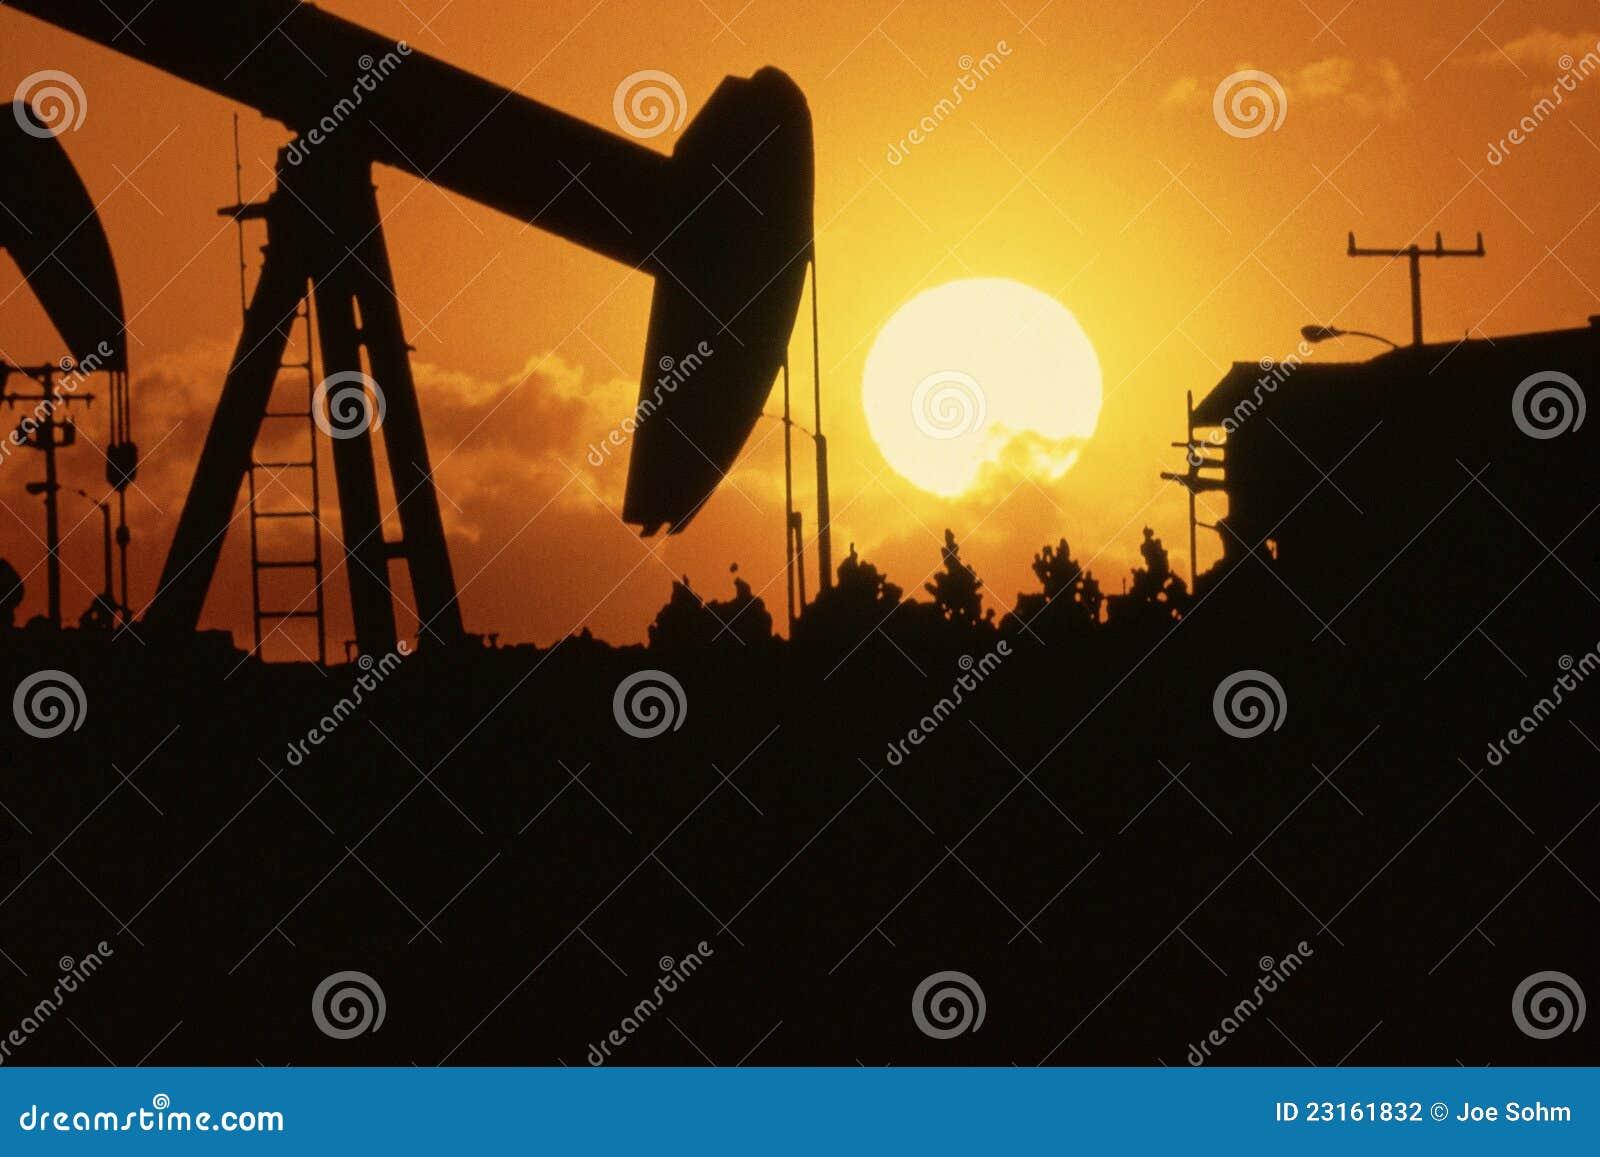 Download Oil drill stock photo. Image of sohm, environmental, orange - 23161832